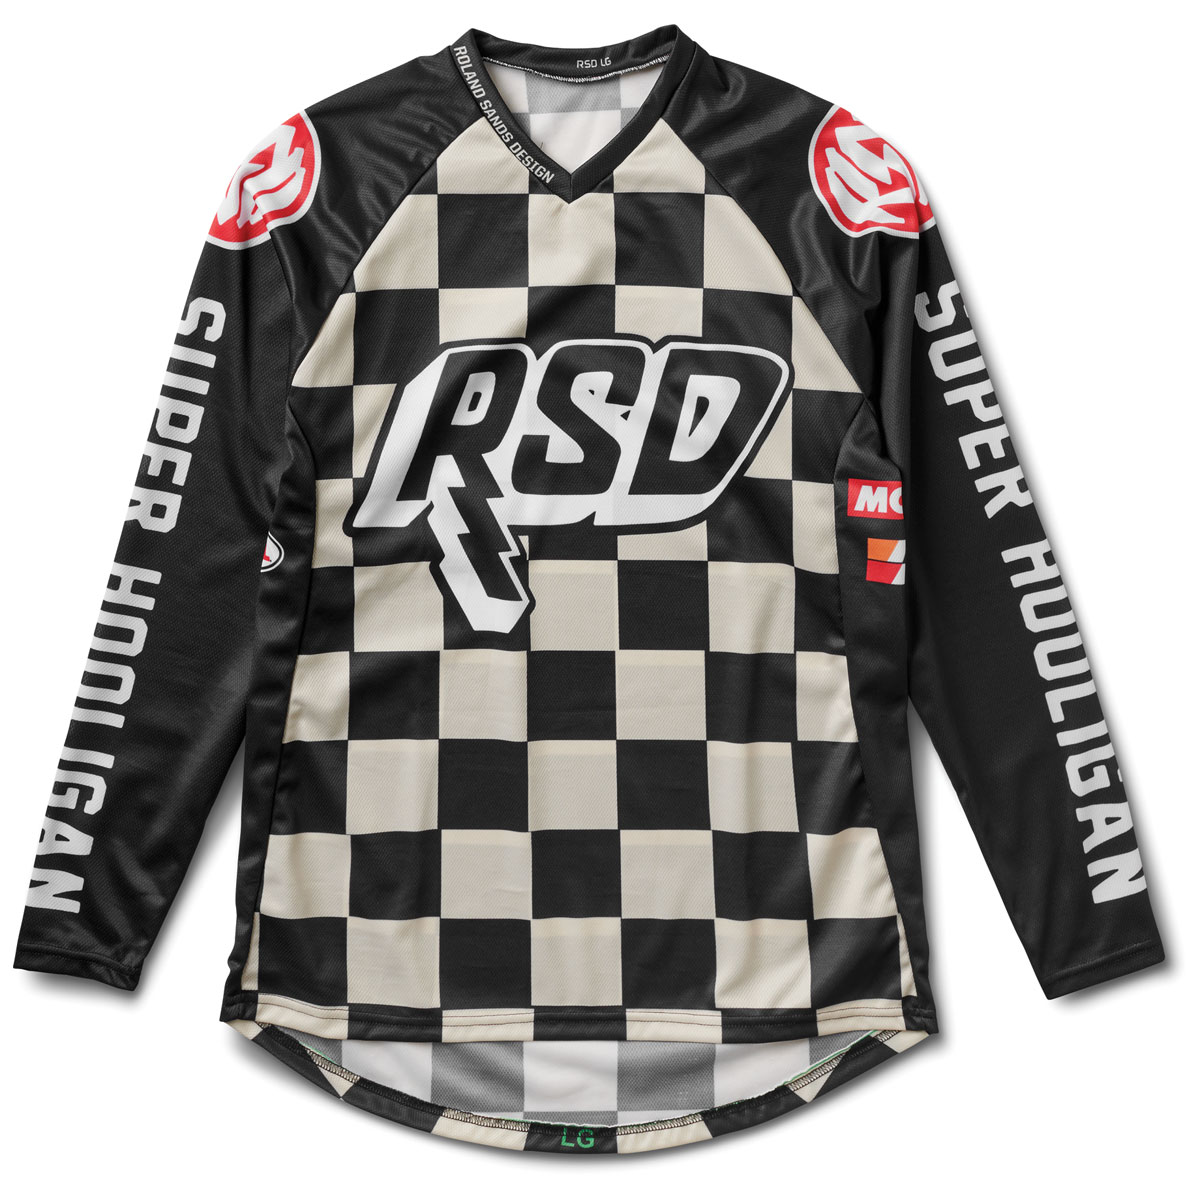 Roland Sands Design Apparel Men's Hooligan Checkers Jersey